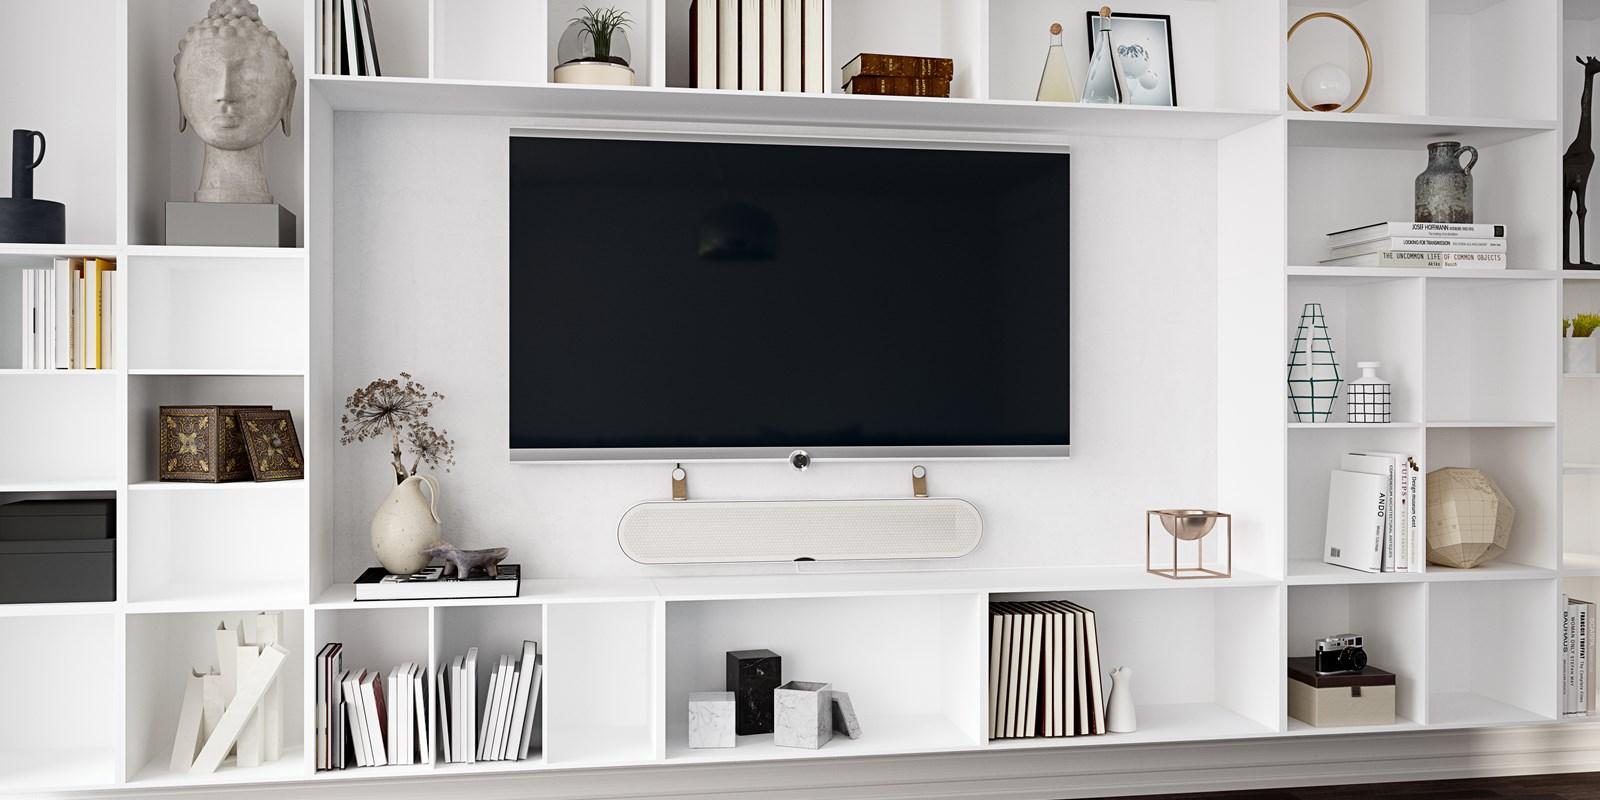 dali-katch-one-interior-livingroom